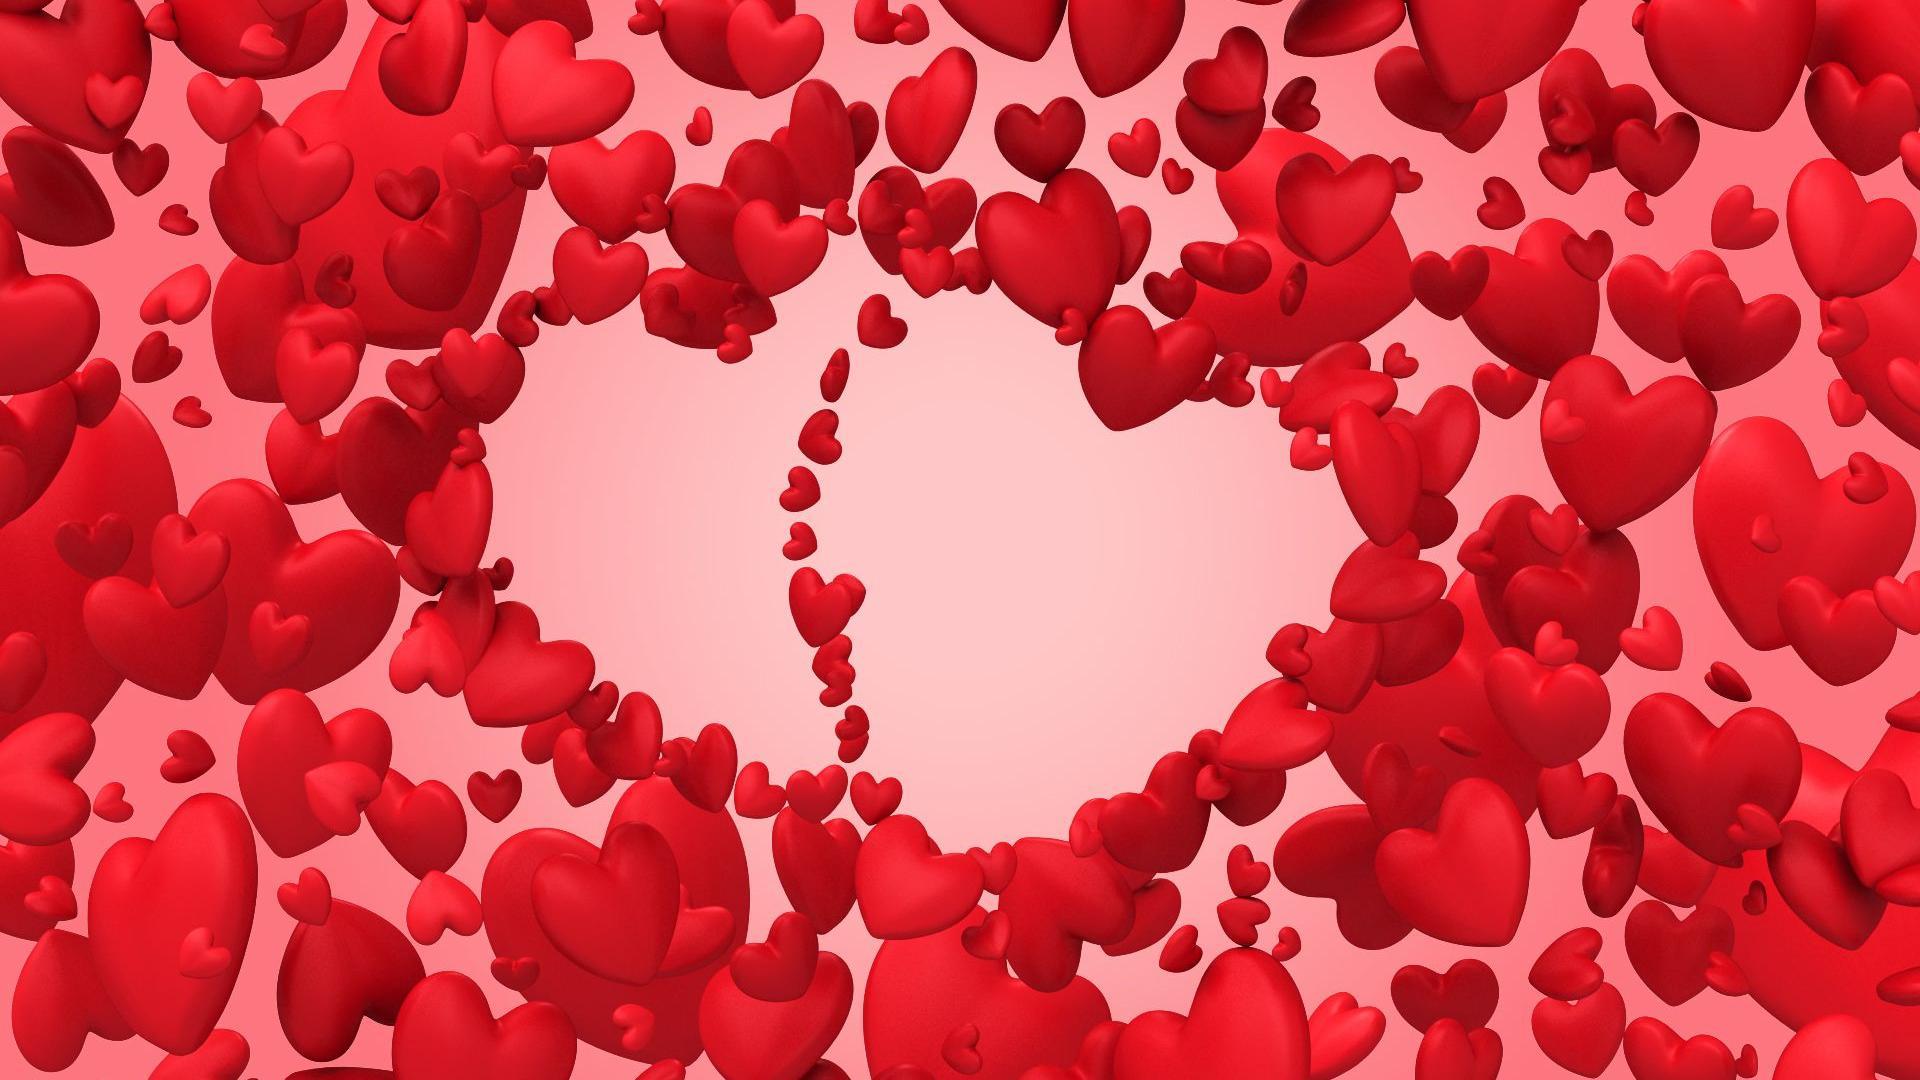 Valentine Day Heart Wallpapers HD Wallpaper of Love   hdwallpaper2013 1920x1080